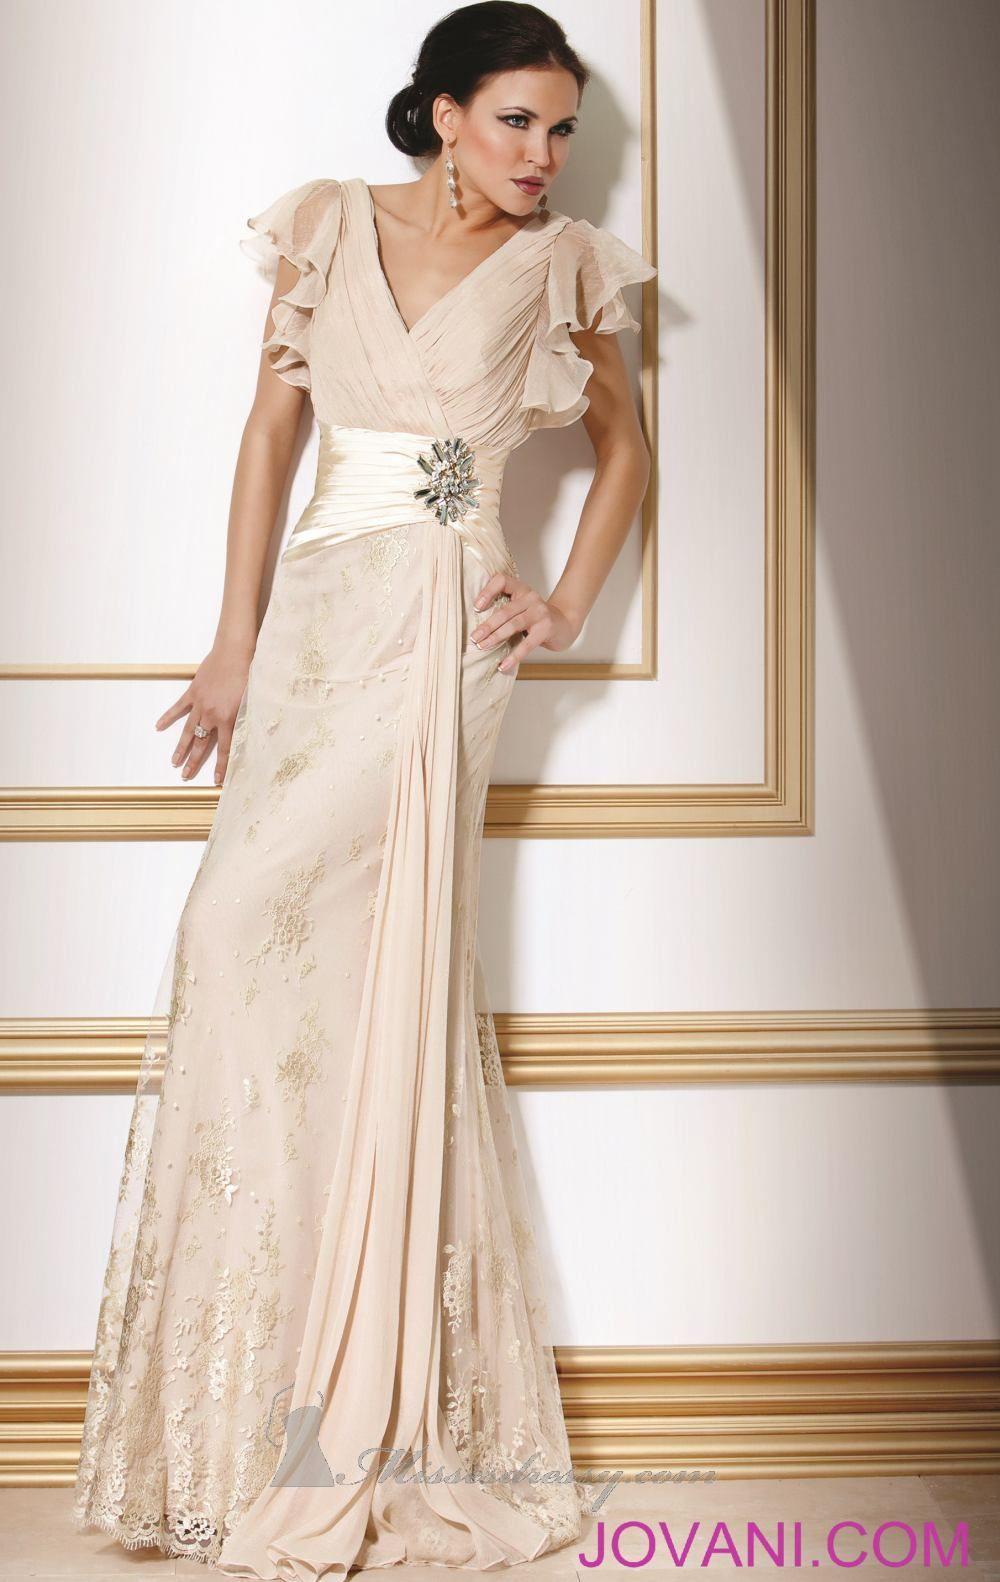 Mother of the bride dresses evening wedding  Jovani  Dress  Misses Dressy Bridal party  Event Dating